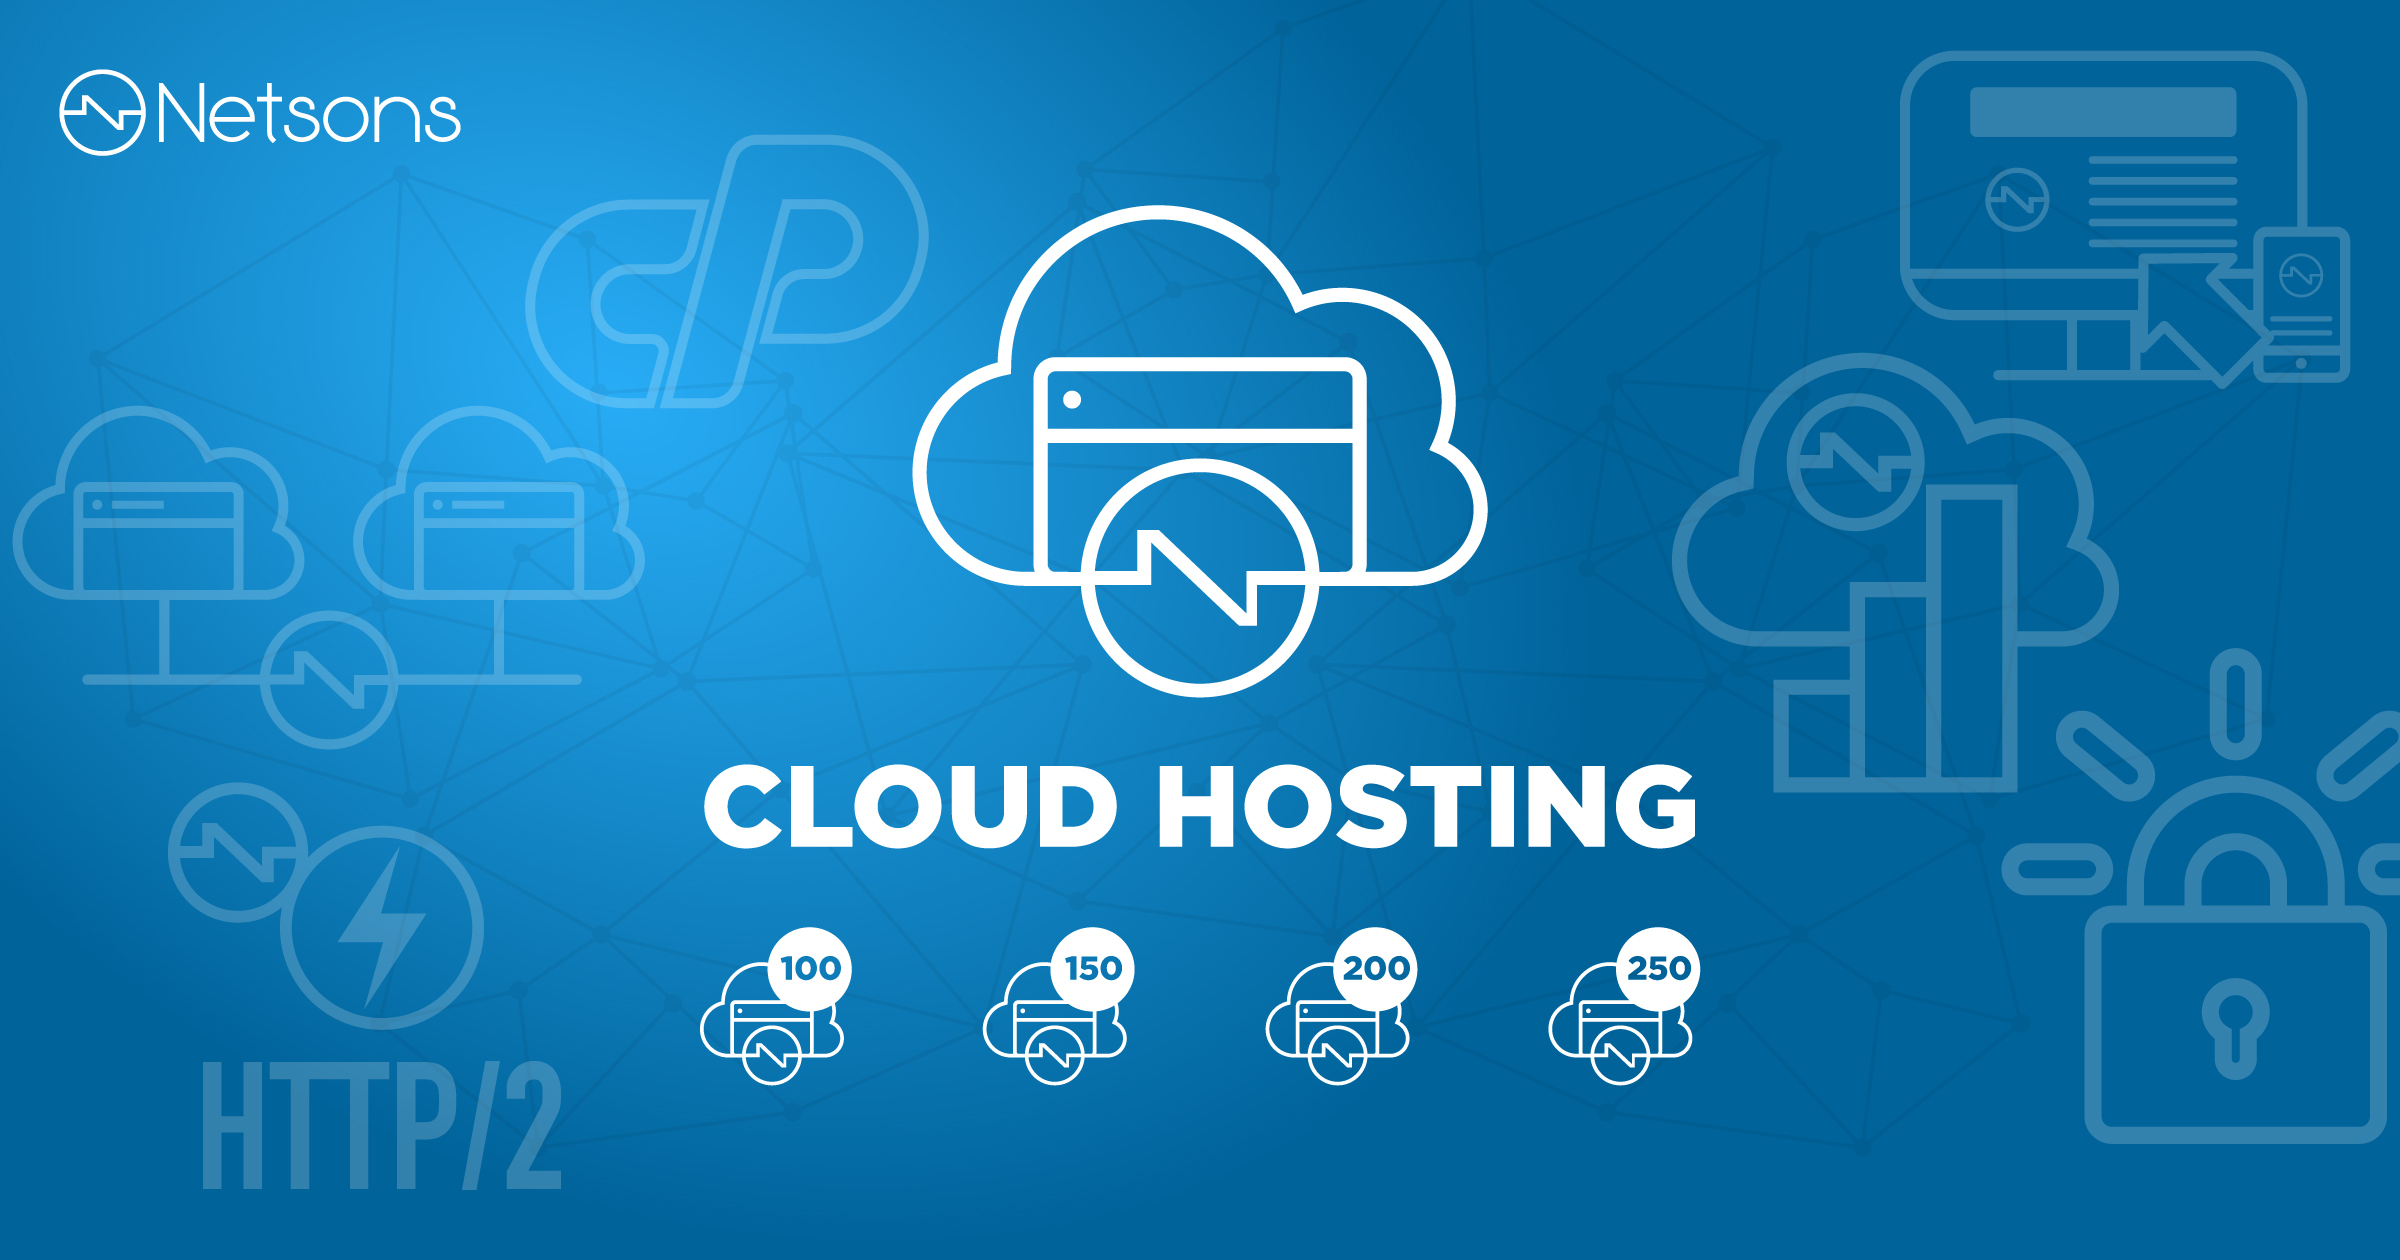 Arrivano i nuovi piani di Cloud Hosting Netsons